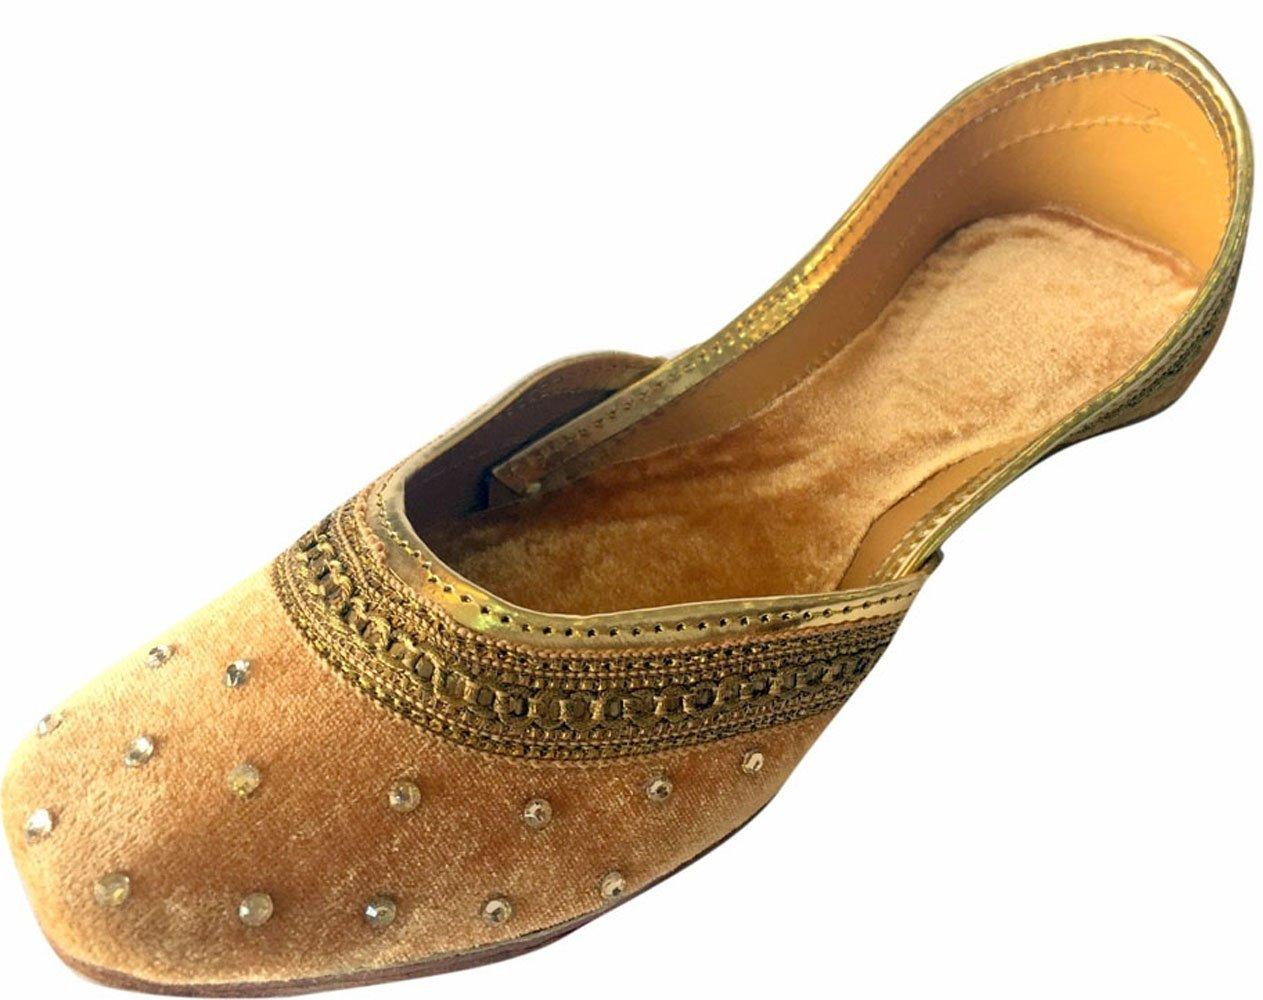 Step n Style Women Flat Velvet Khussa Shoes Punjabi Jutti Traditional Mojari Loafer Pumps DD183G